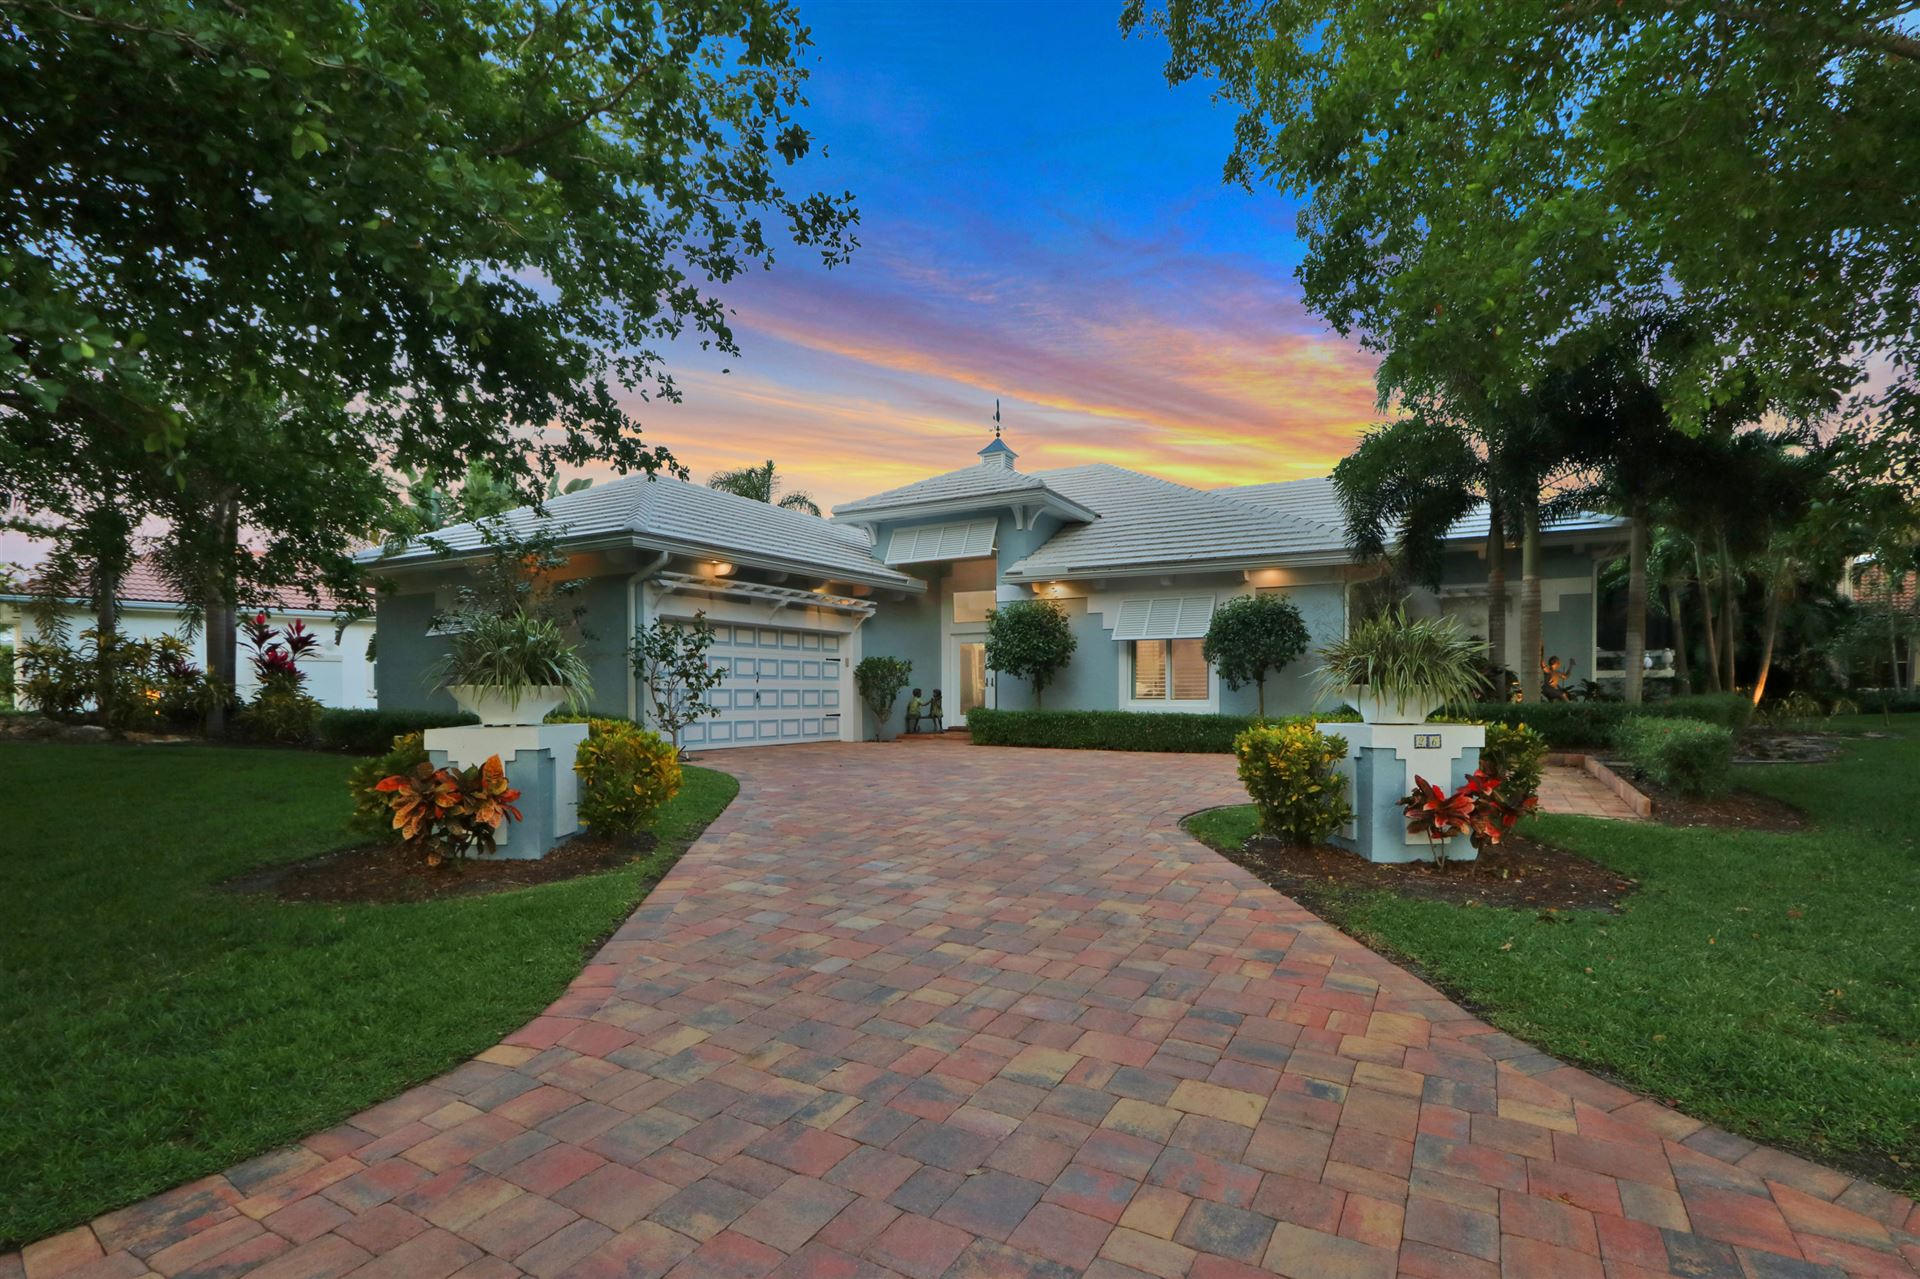 Photo of 26 Cayman Place, Palm Beach Gardens, FL 33418 (MLS # RX-10713783)